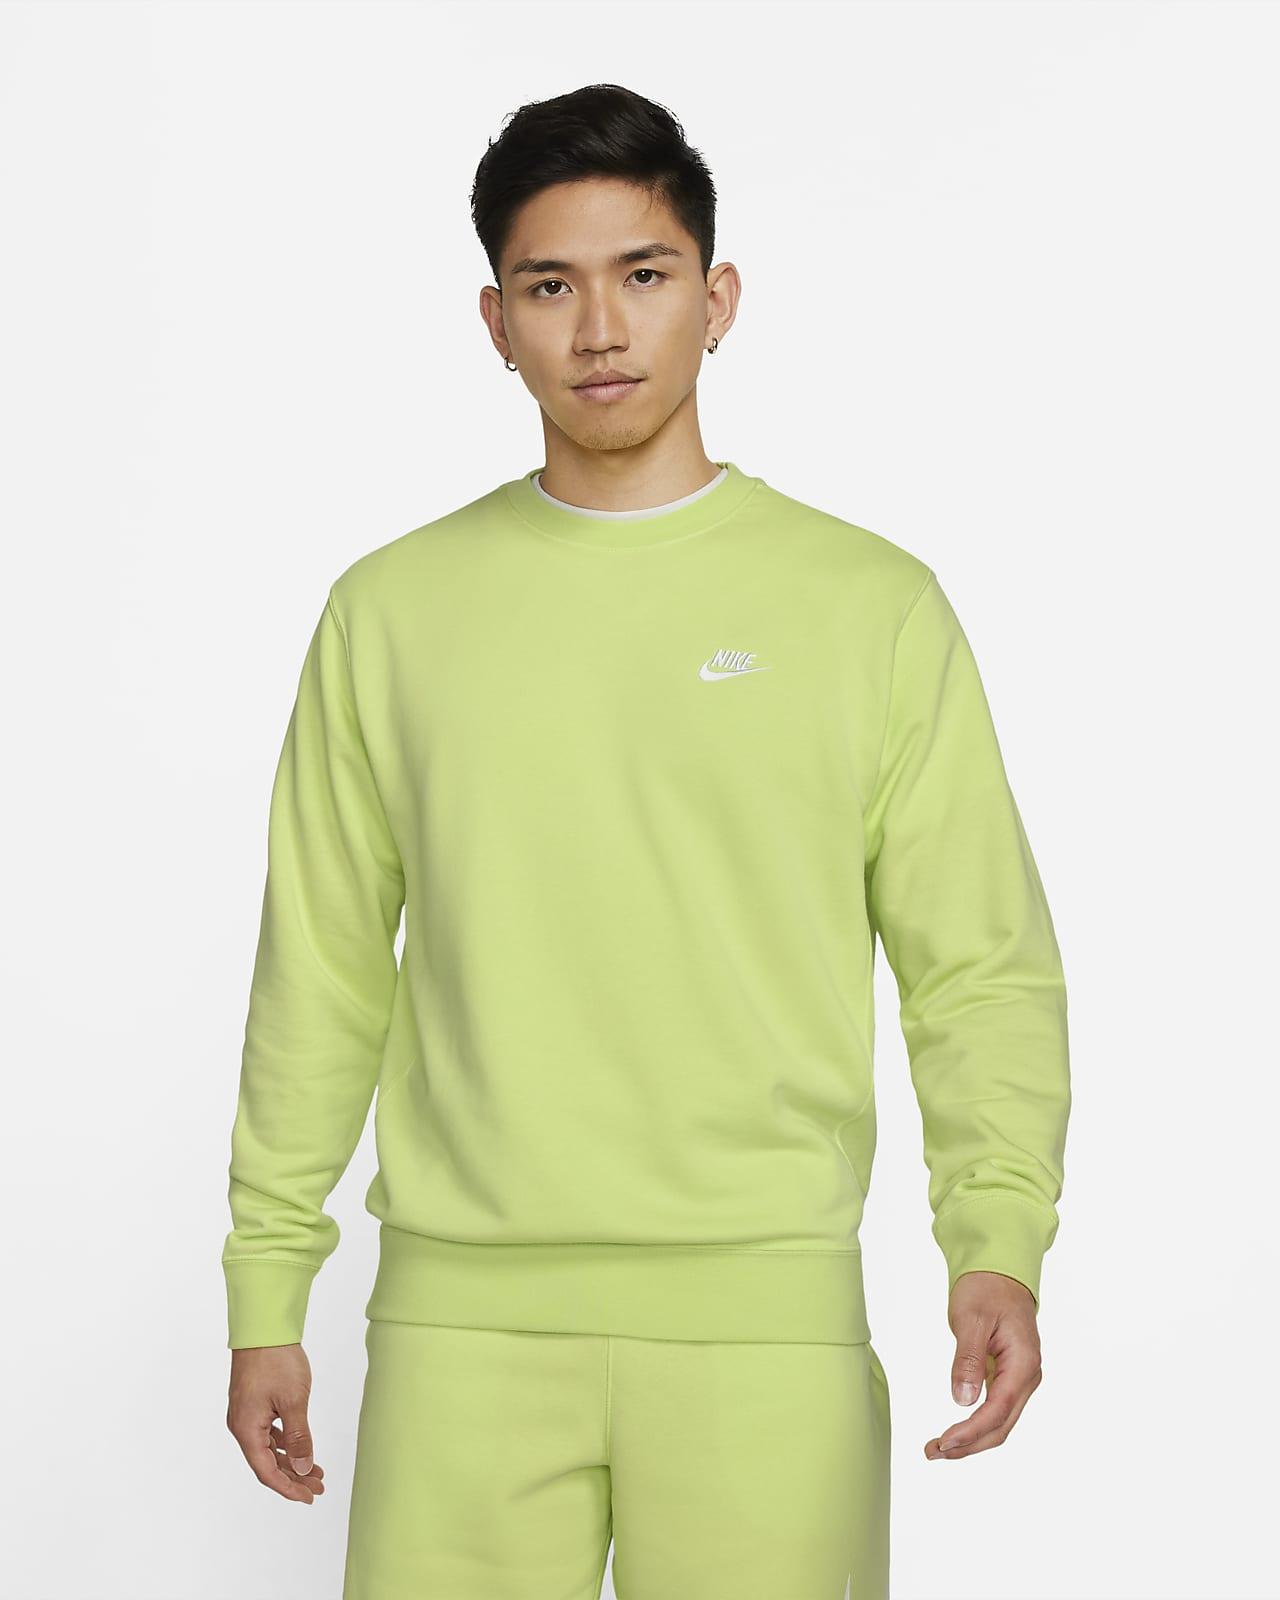 Nike Sportswear Club French Terry 男子圆领上衣